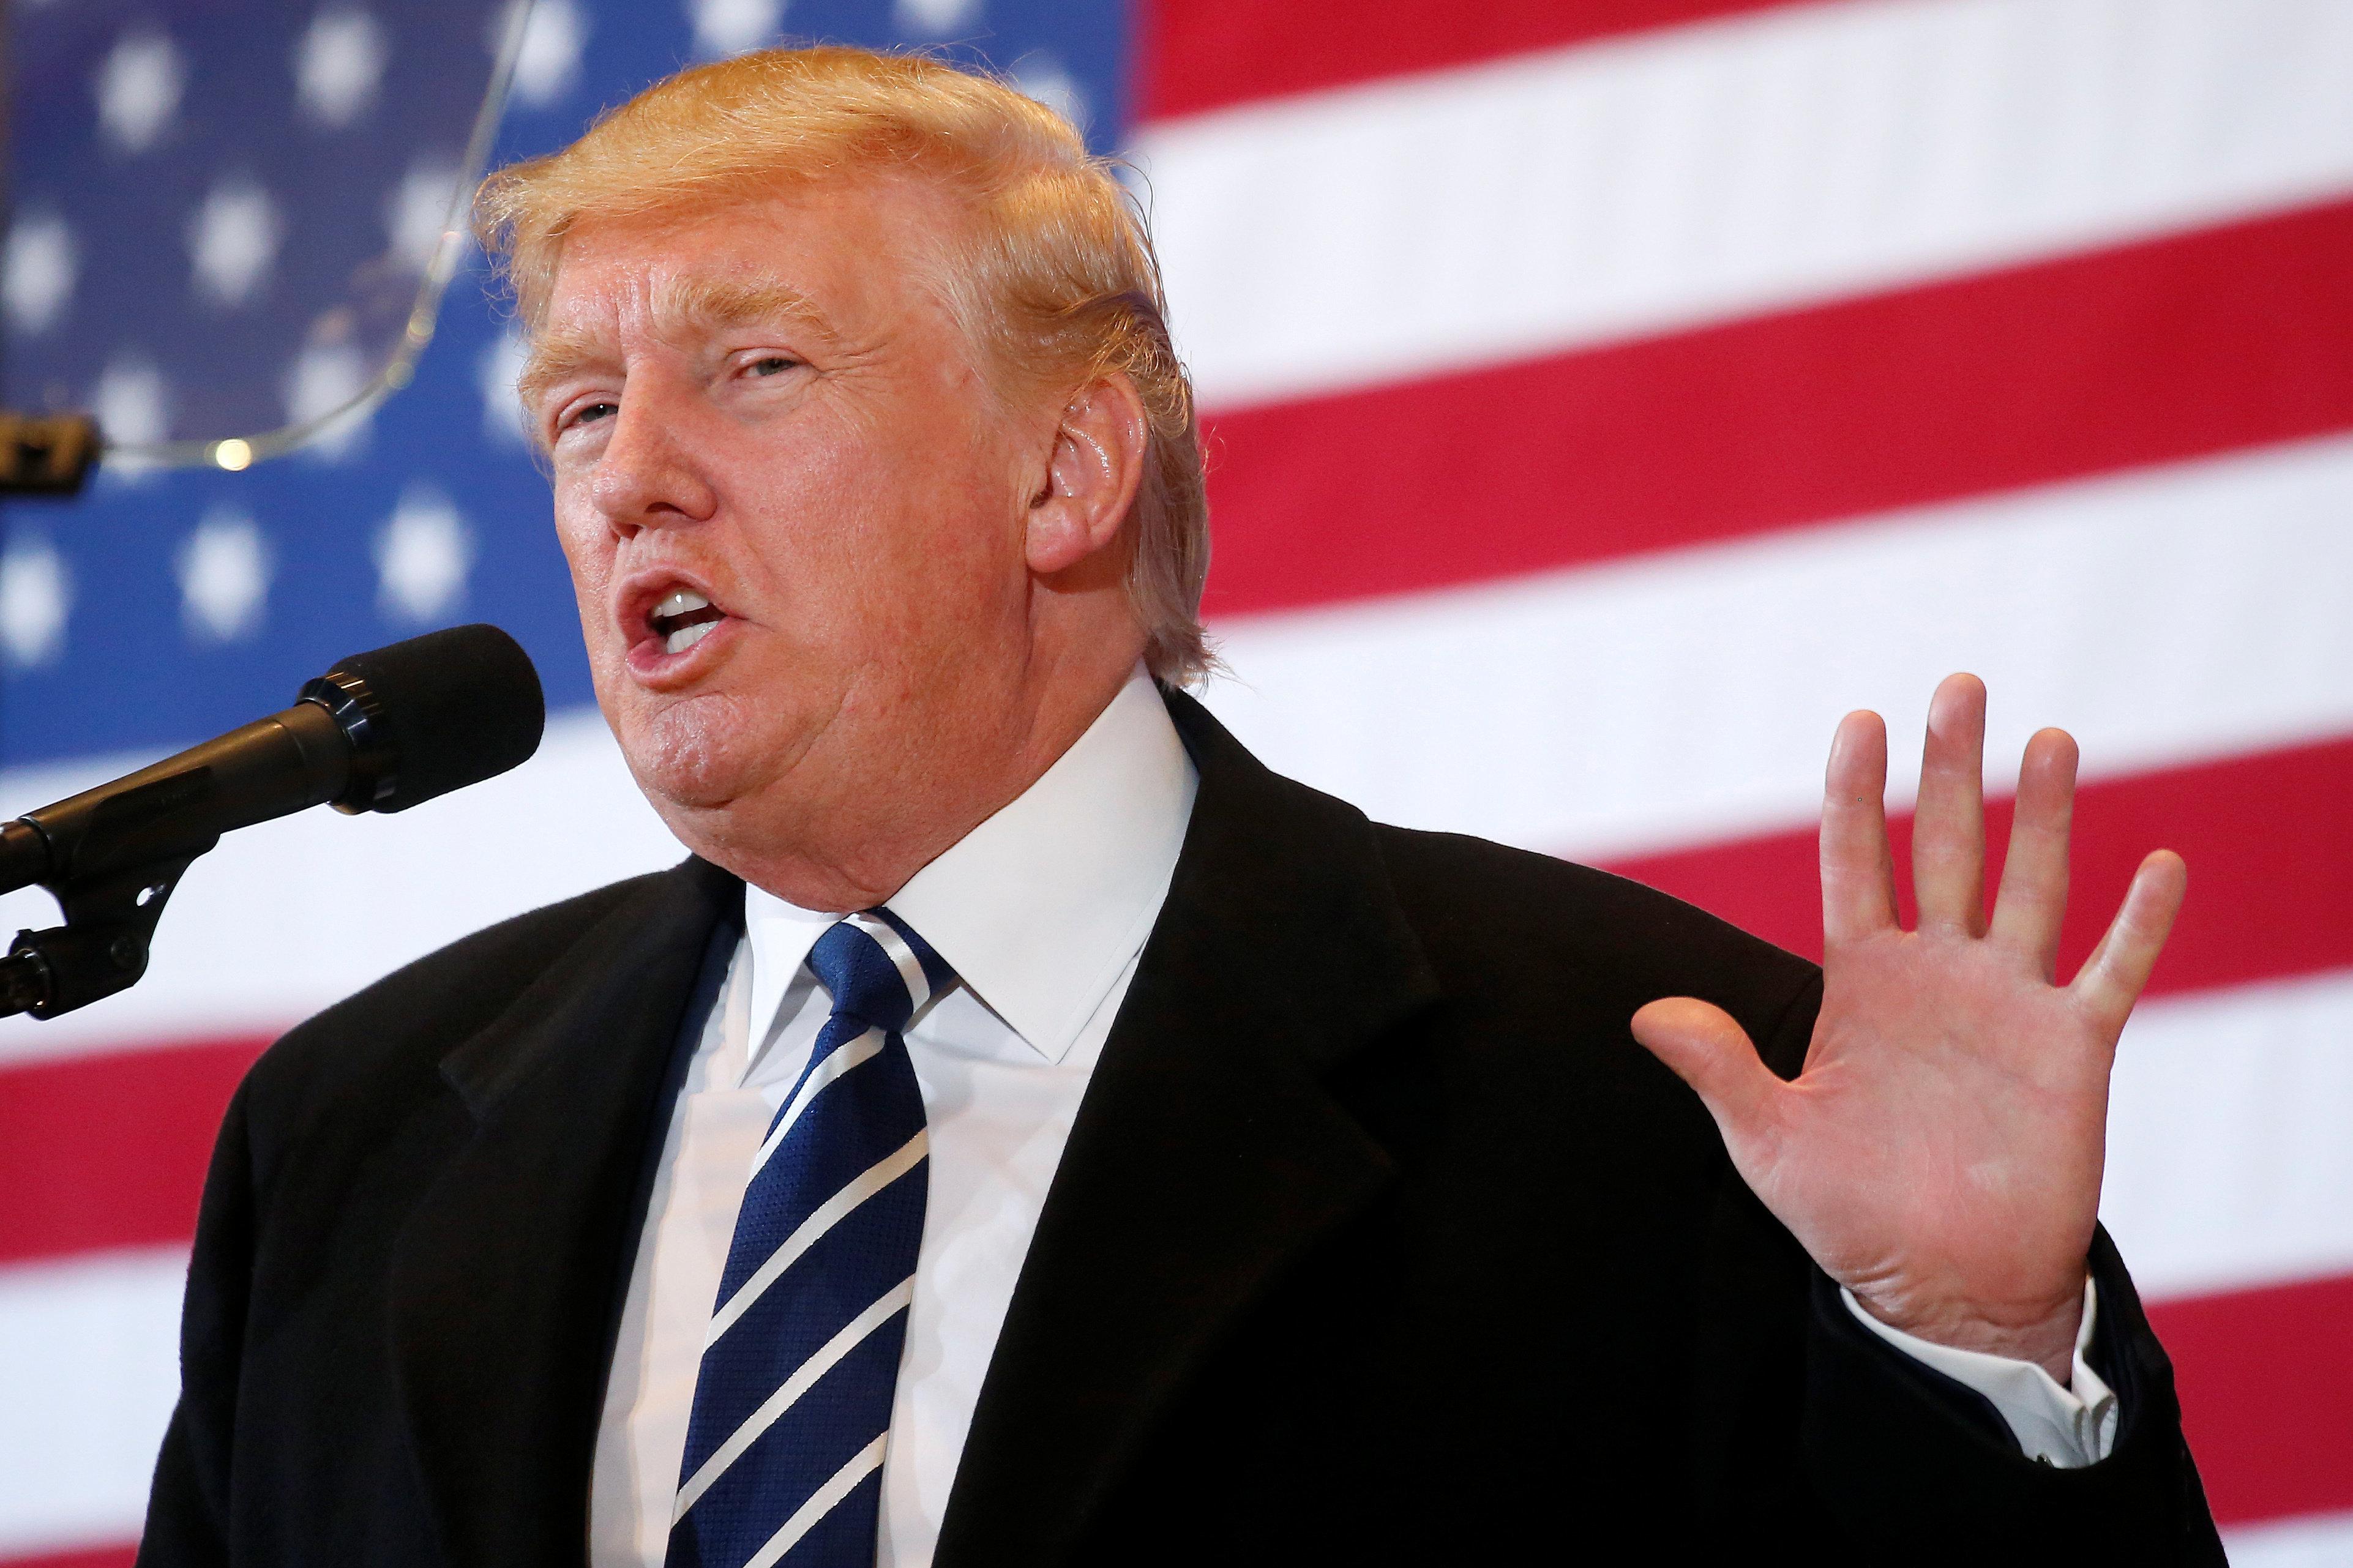 Republican presidential nominee Donald Trump speaks at a campaign event in Cedar Rapids, Iowa, U.S. October 28, 2016.  REUTERS/Carlo Allegri